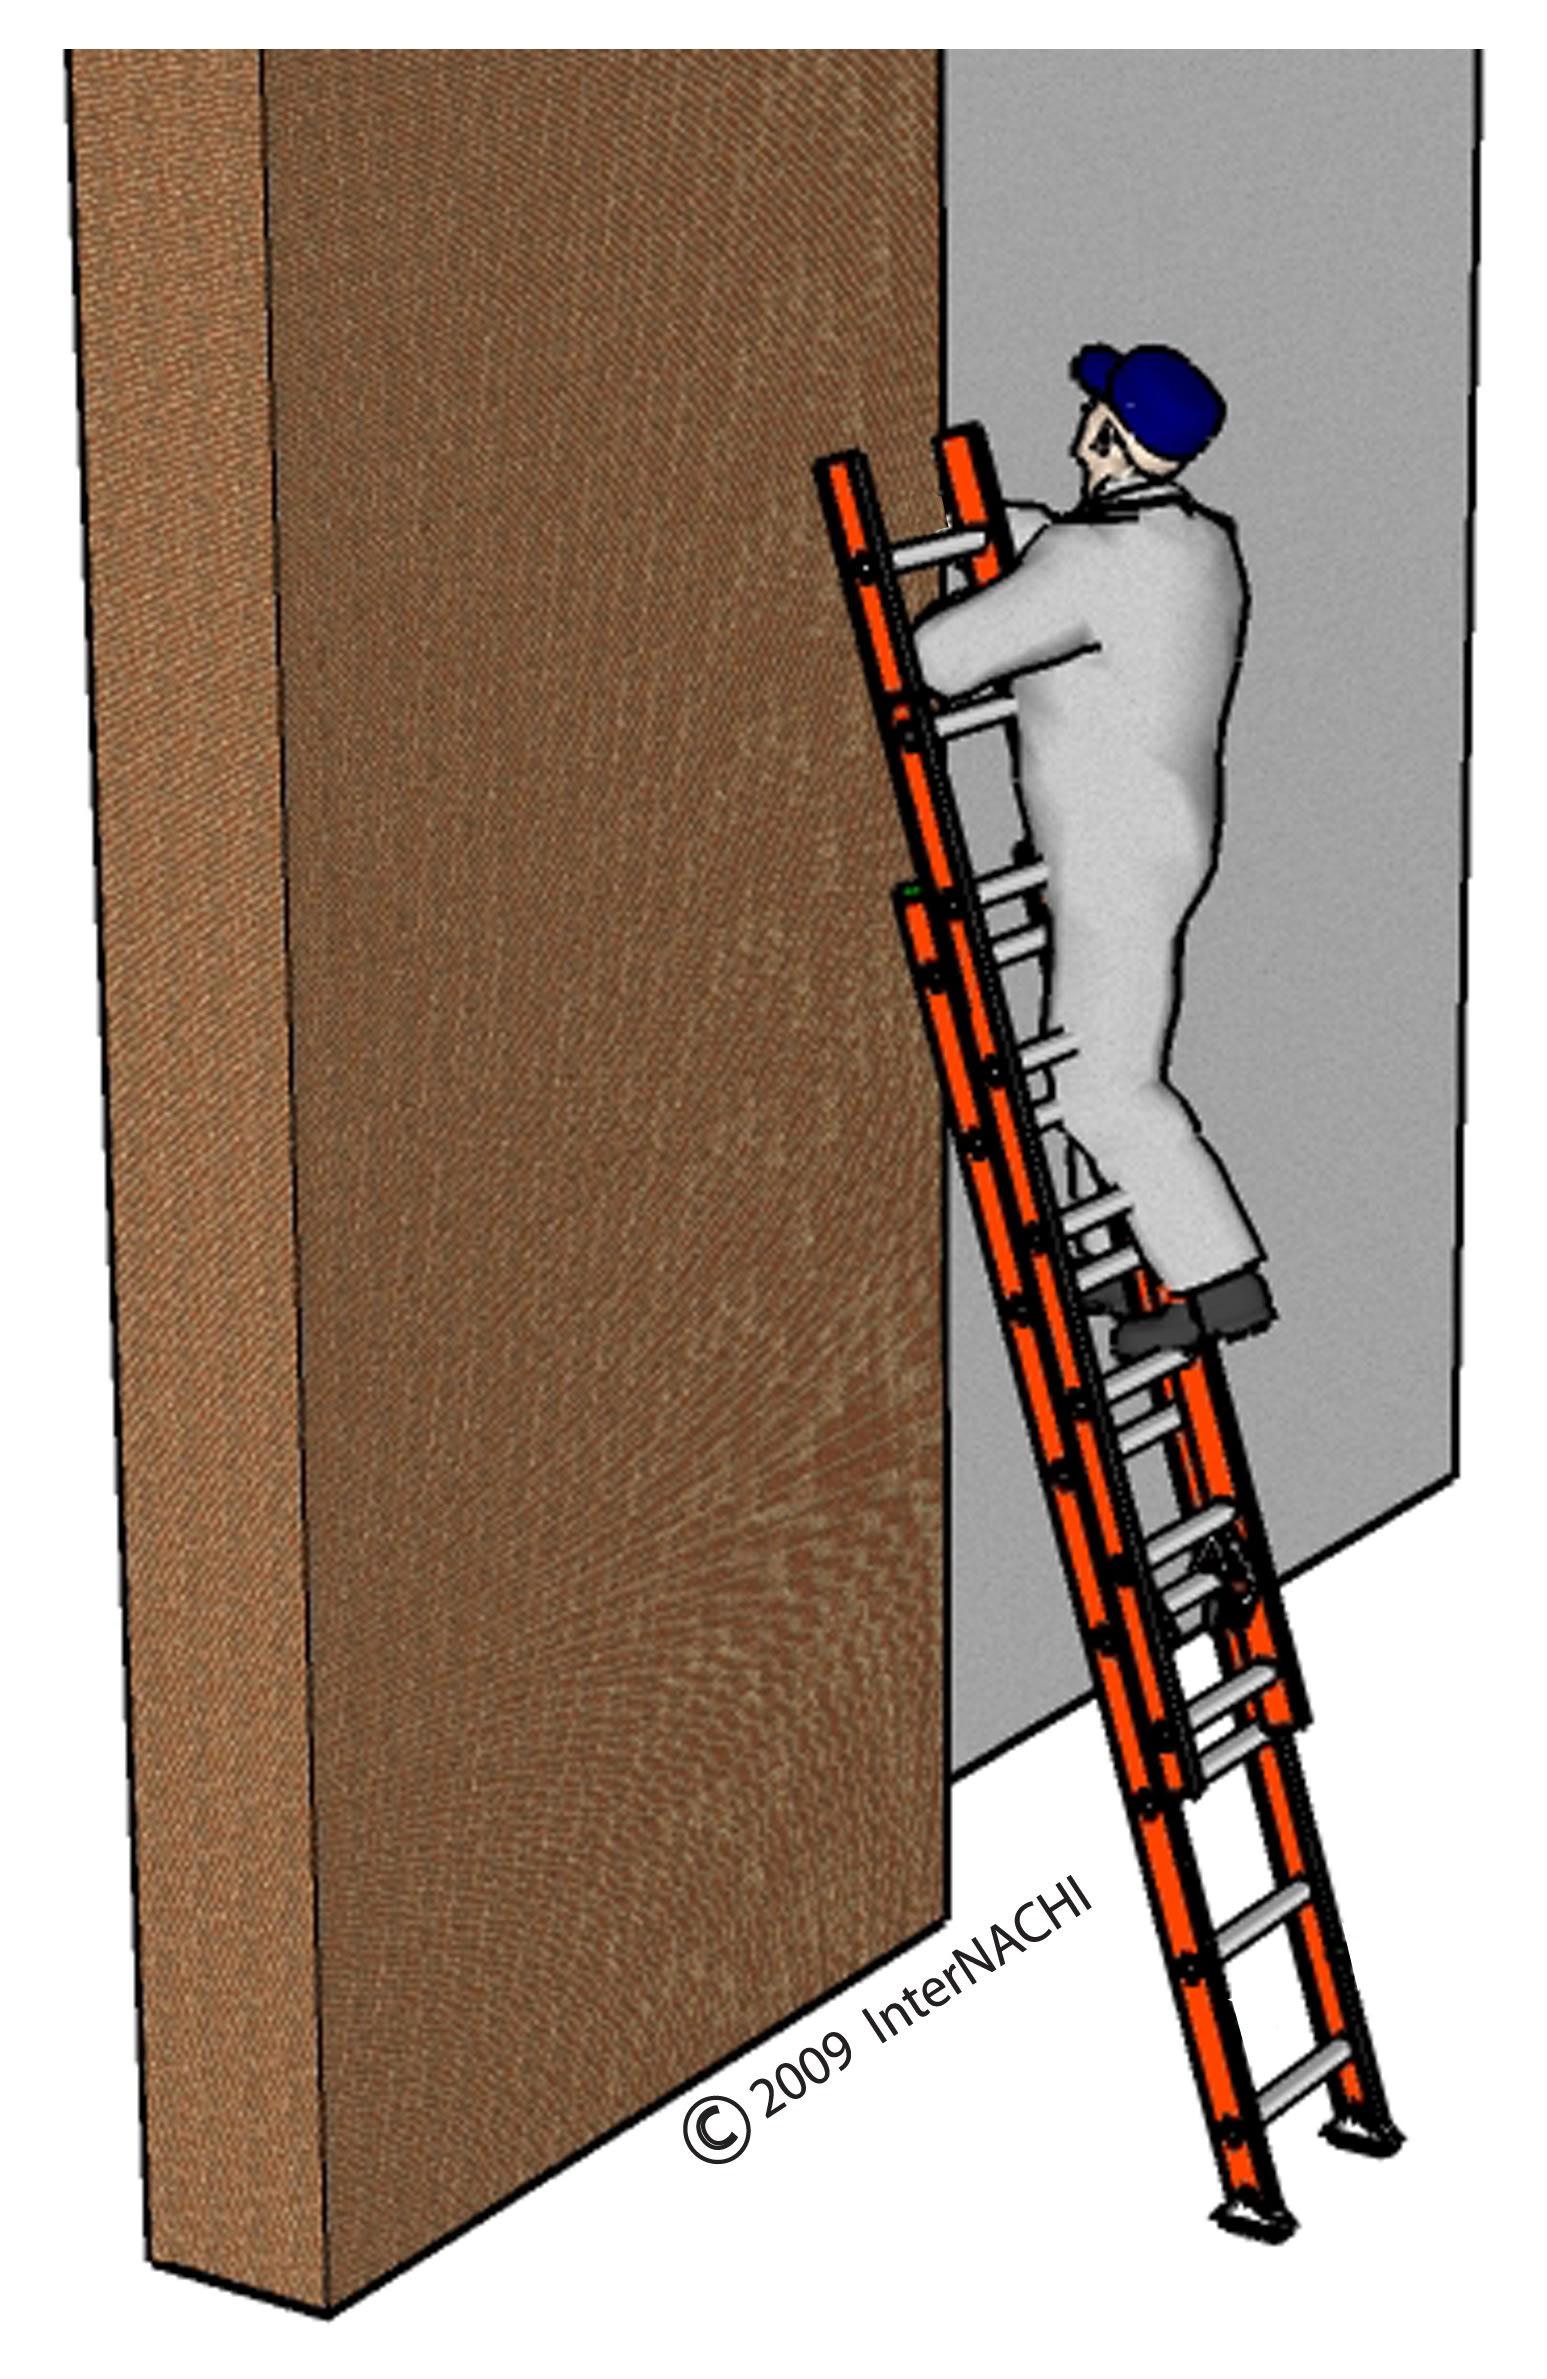 Proper use of a ladder.